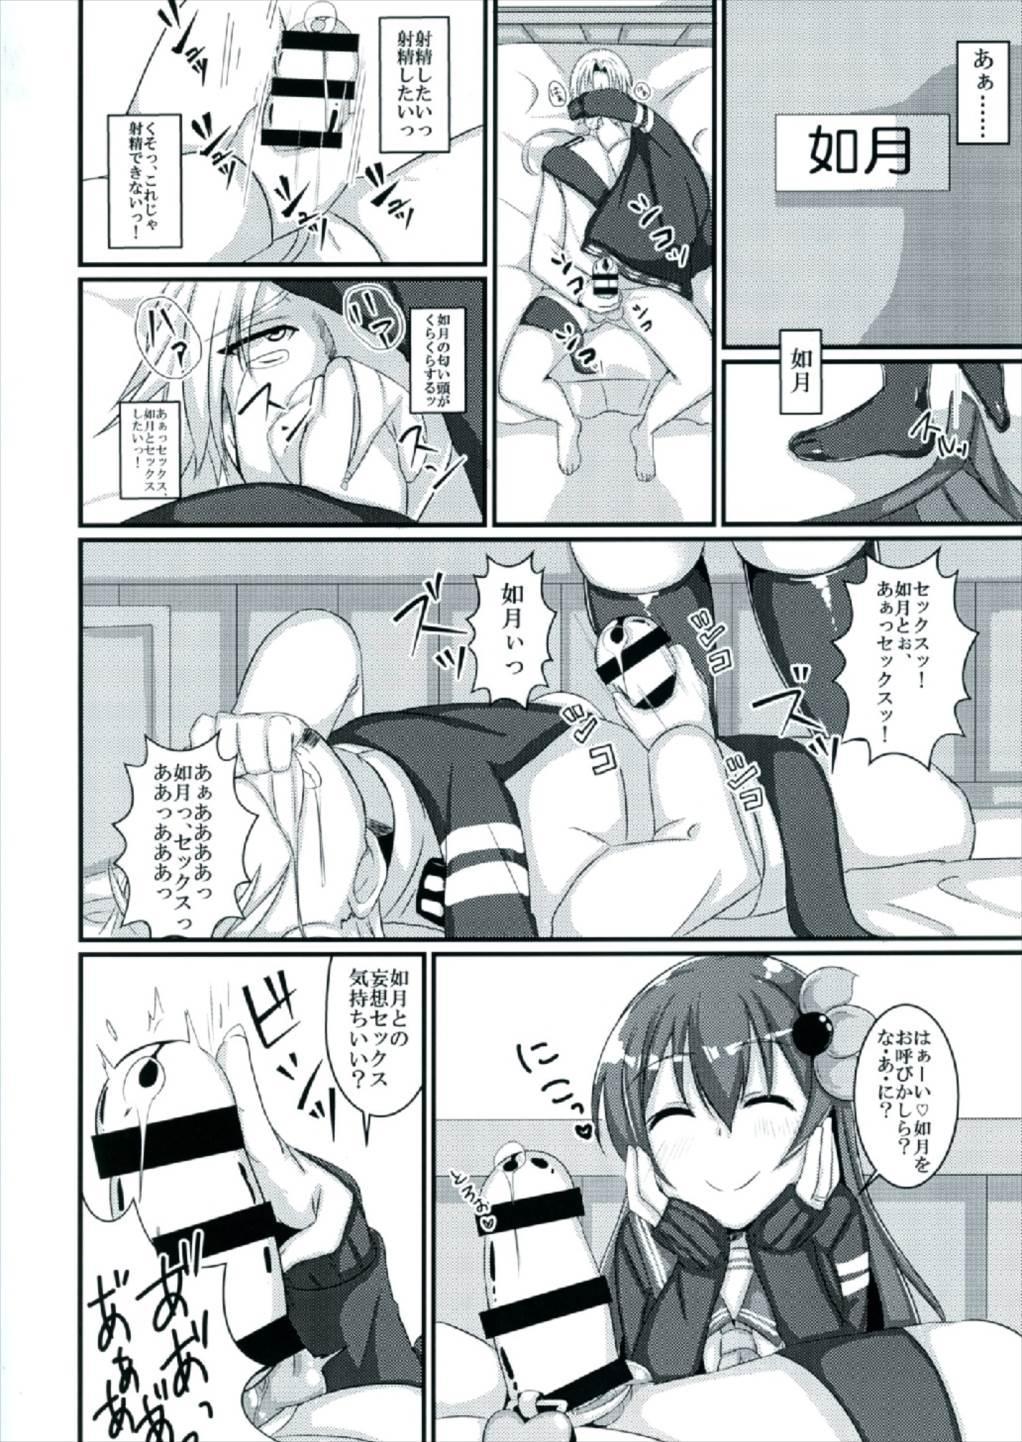 Mou Kisaragi Shika Aisenai! 13